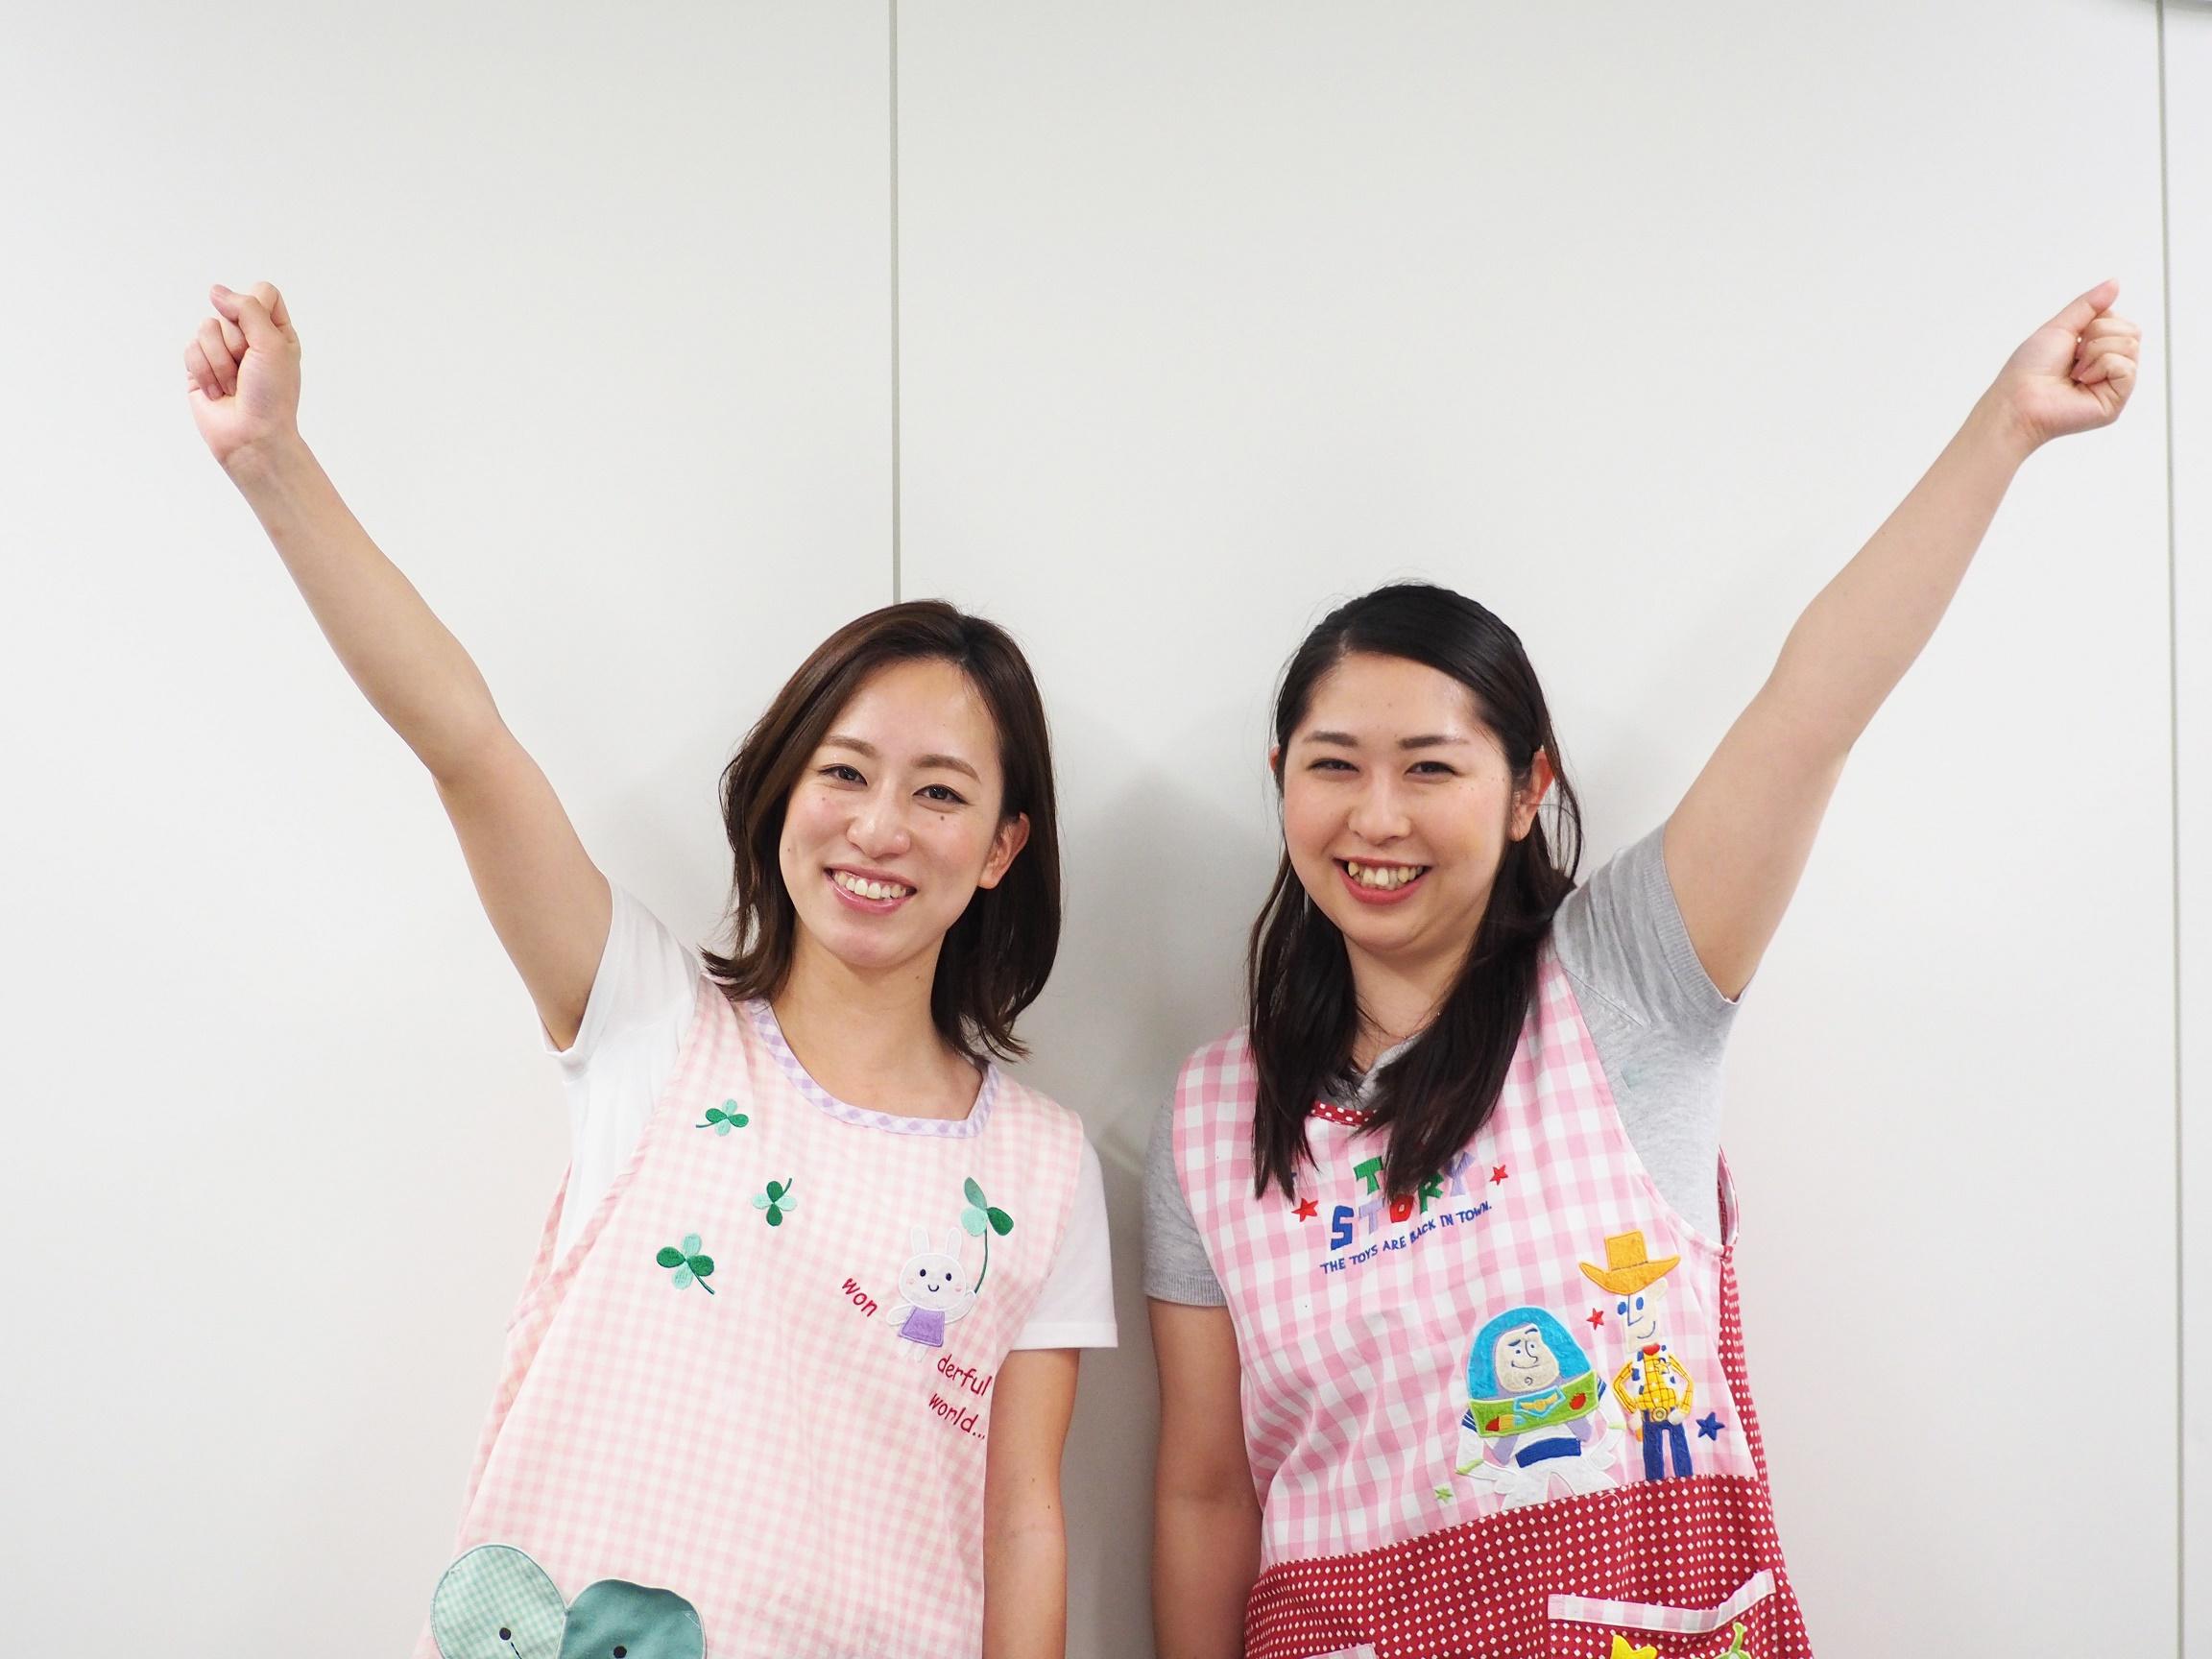 【派遣】千鳥町駅徒歩5分の認可保育園♪(サポート業務)